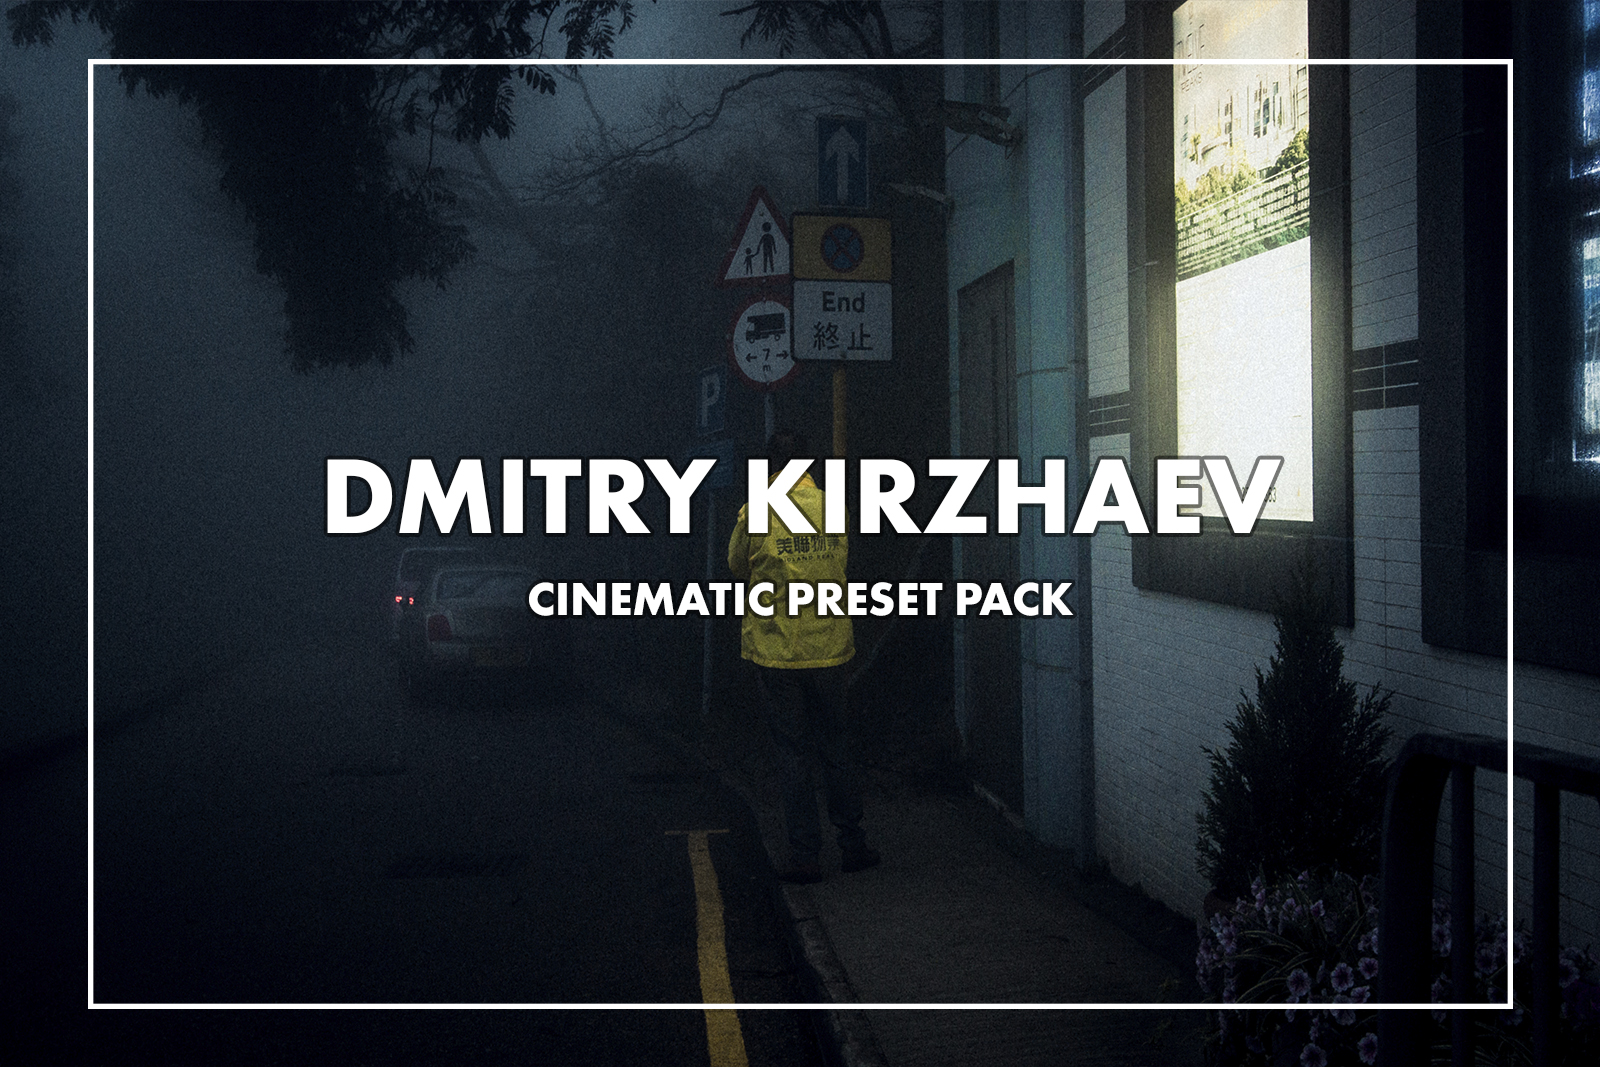 21 Cinematic LR Presets (Desktop + Mobile) by Dmitry Kirzhaev @k1rzhaev